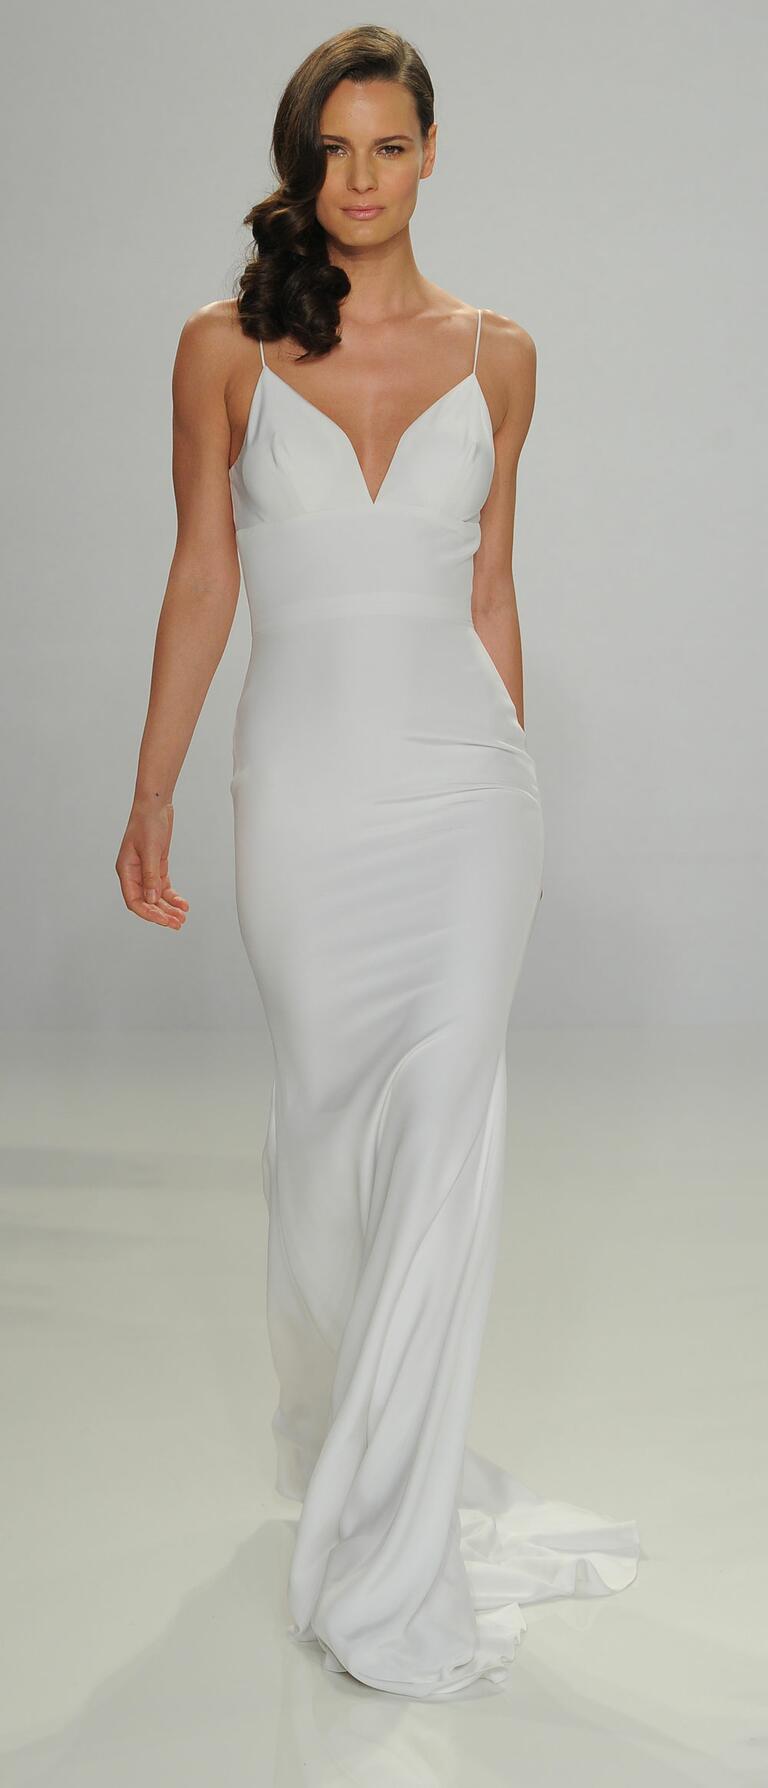 Christian Siriano Spring 2017 slip wedding dress